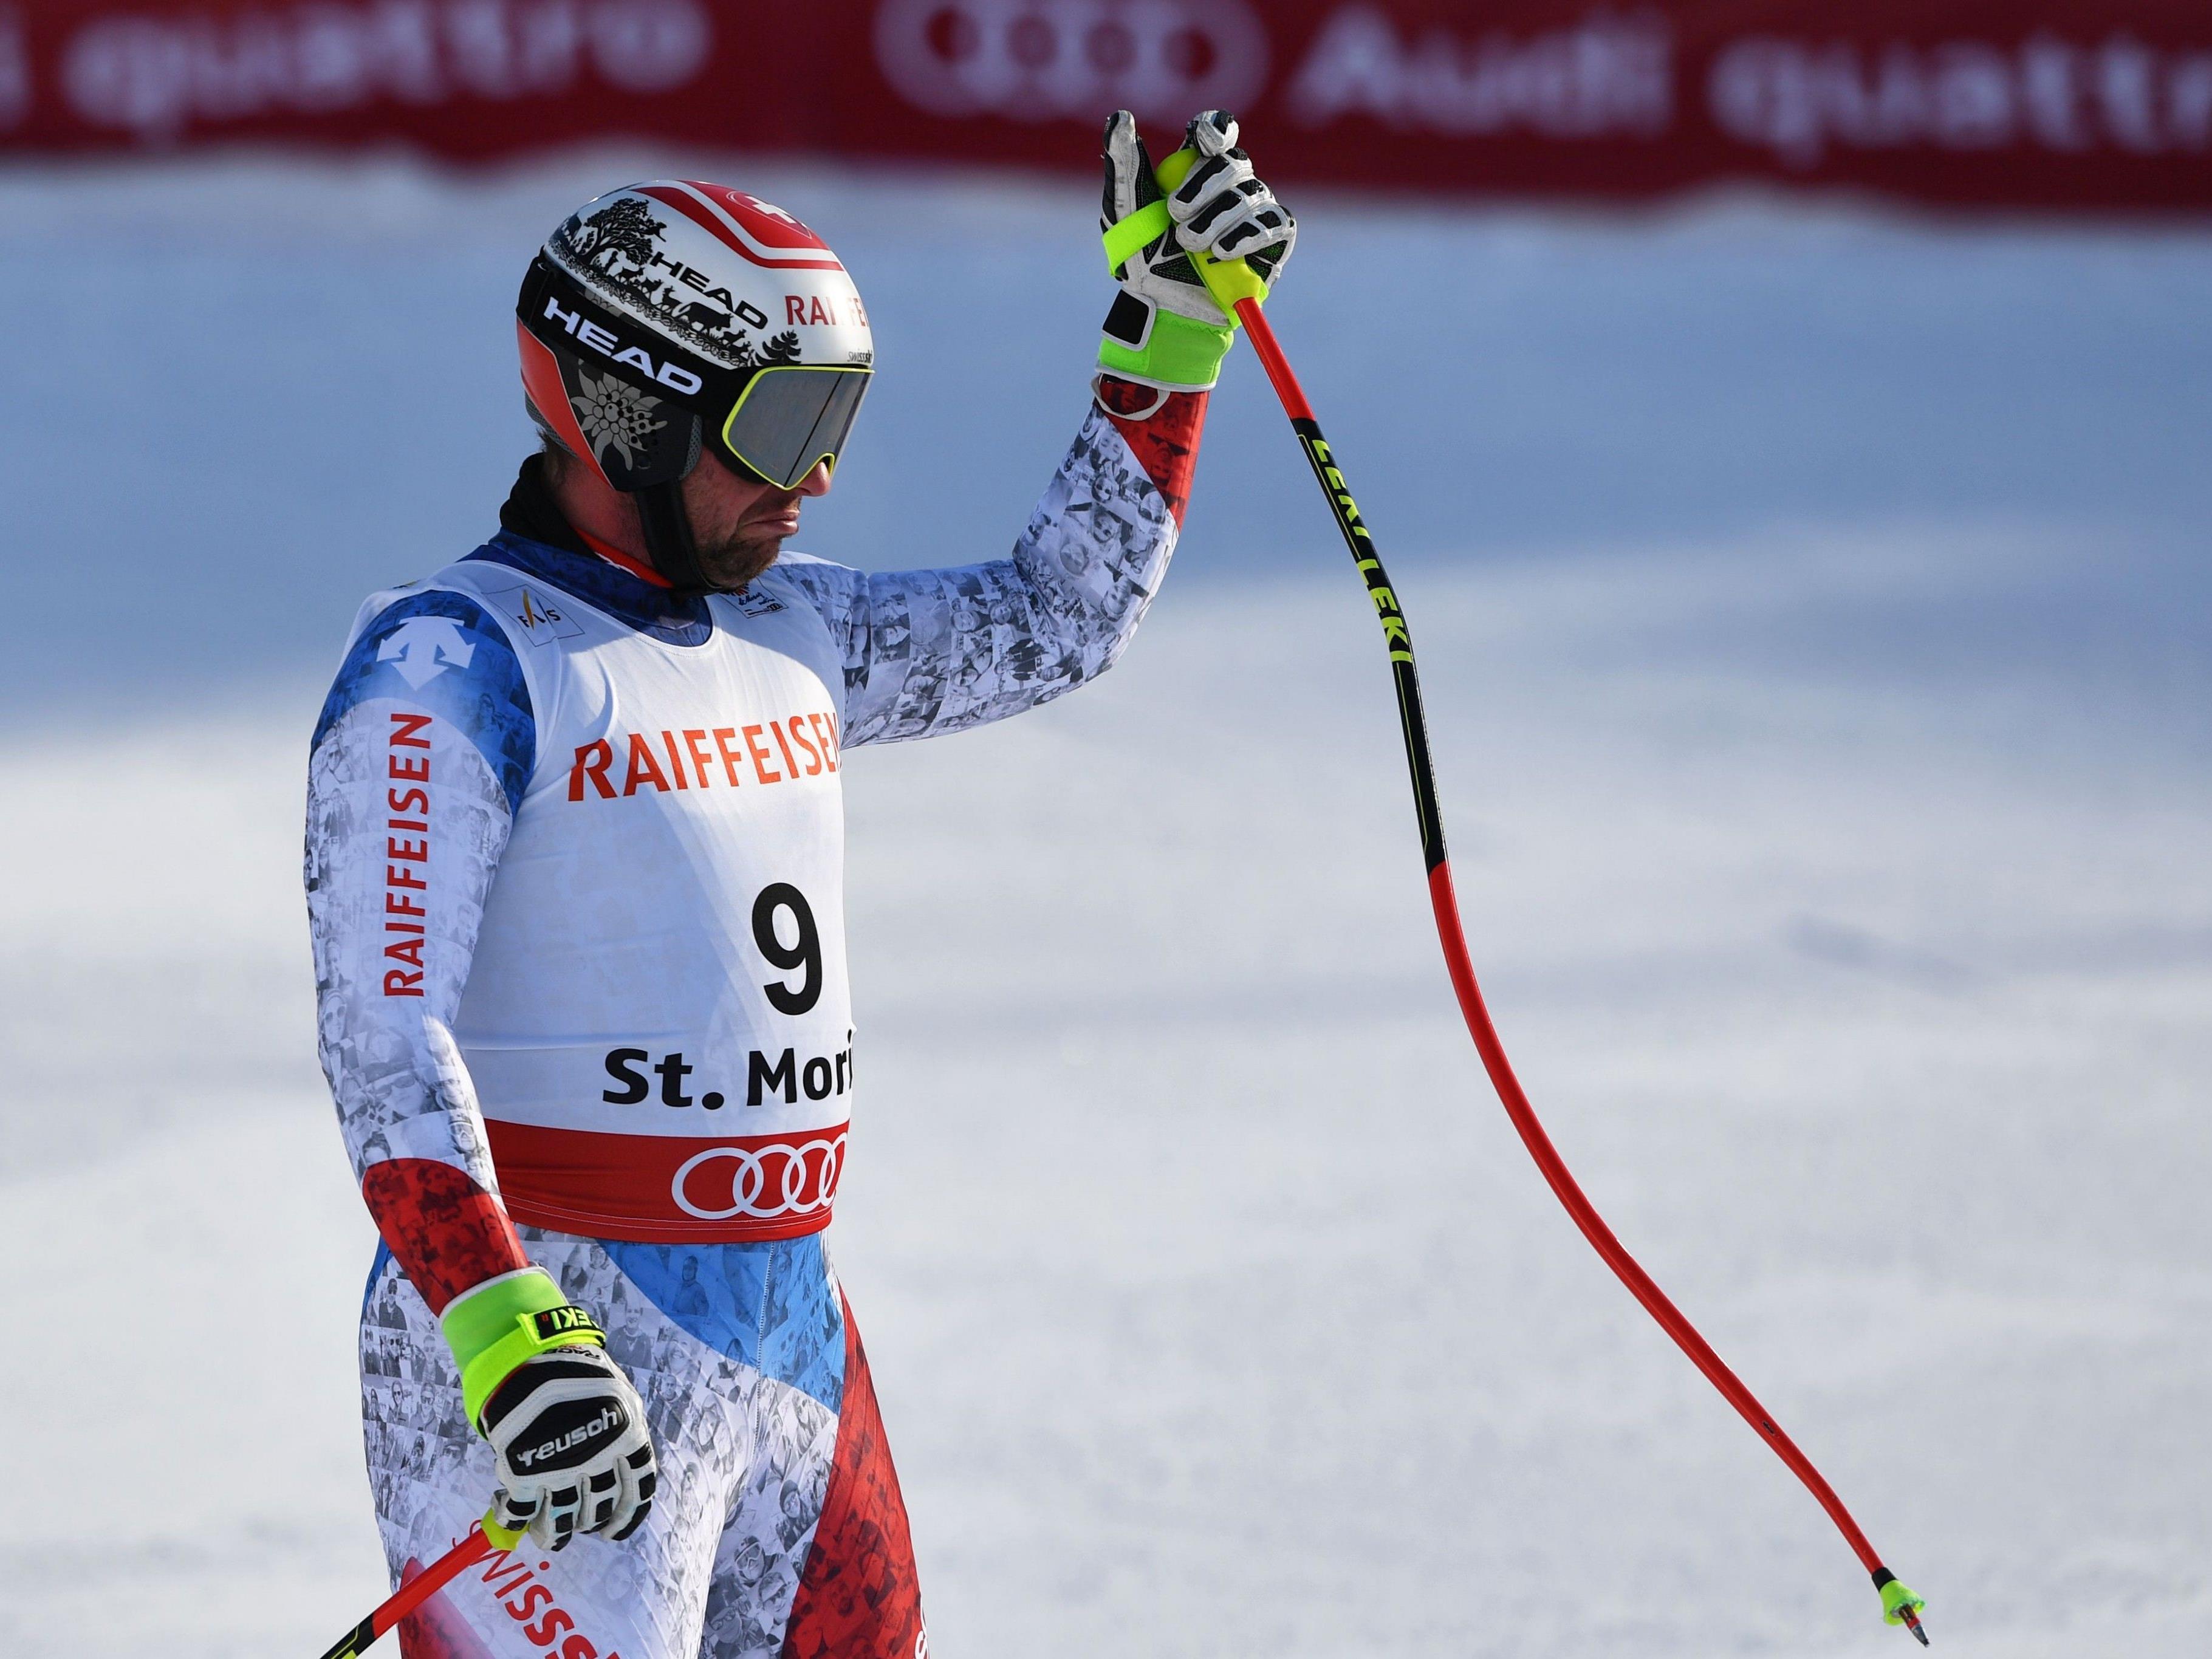 Beat Feuz war Ski-WM-Abfahrt-Trainingsbester.